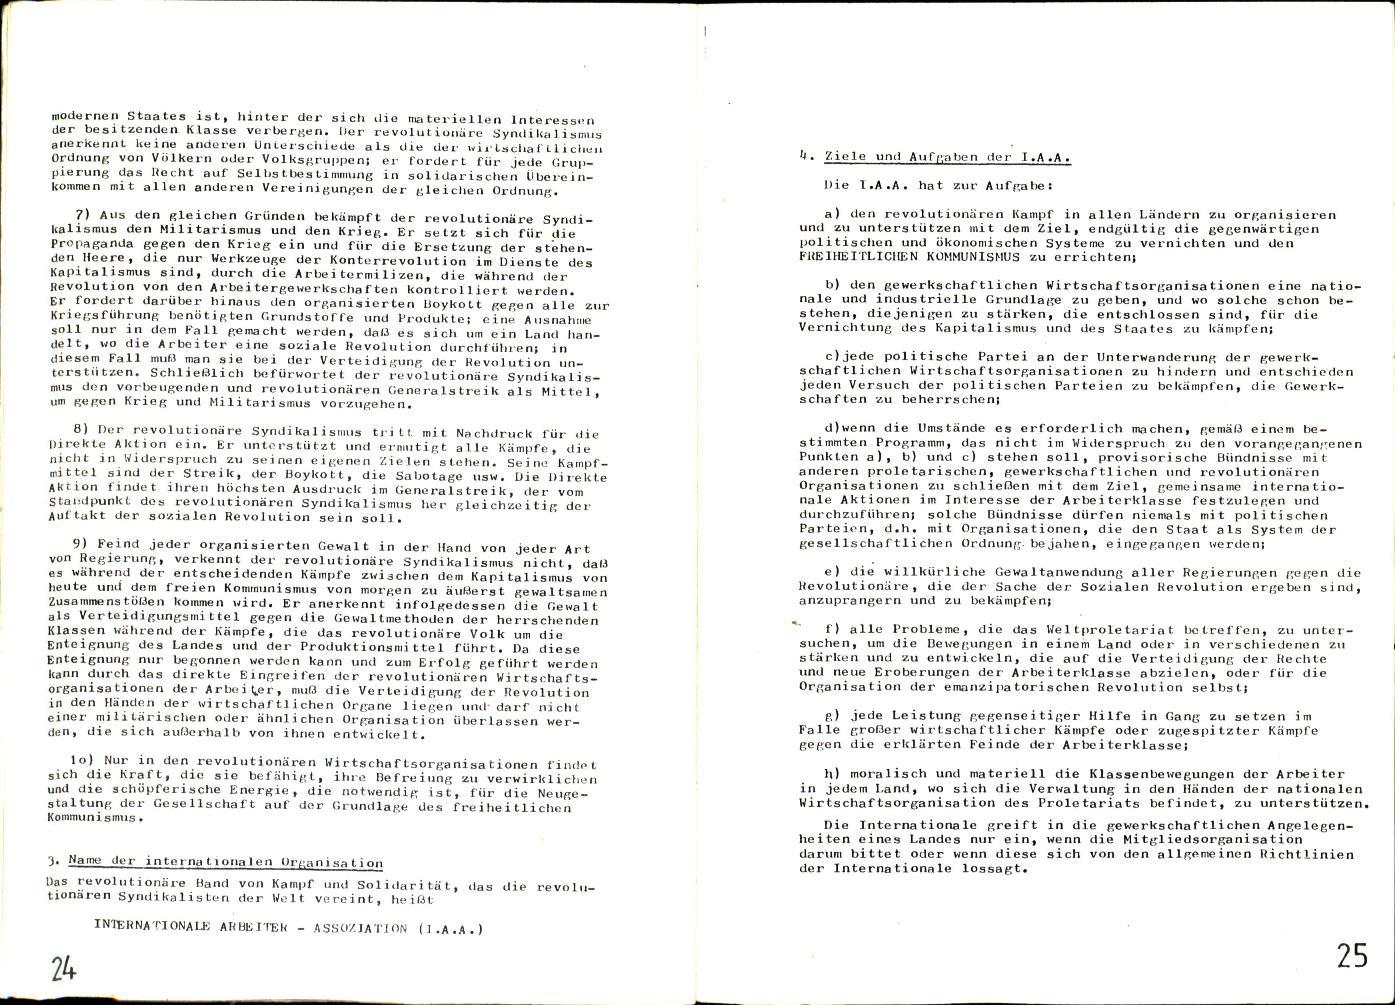 FAU_1979_Arbeitsgrundlage_13